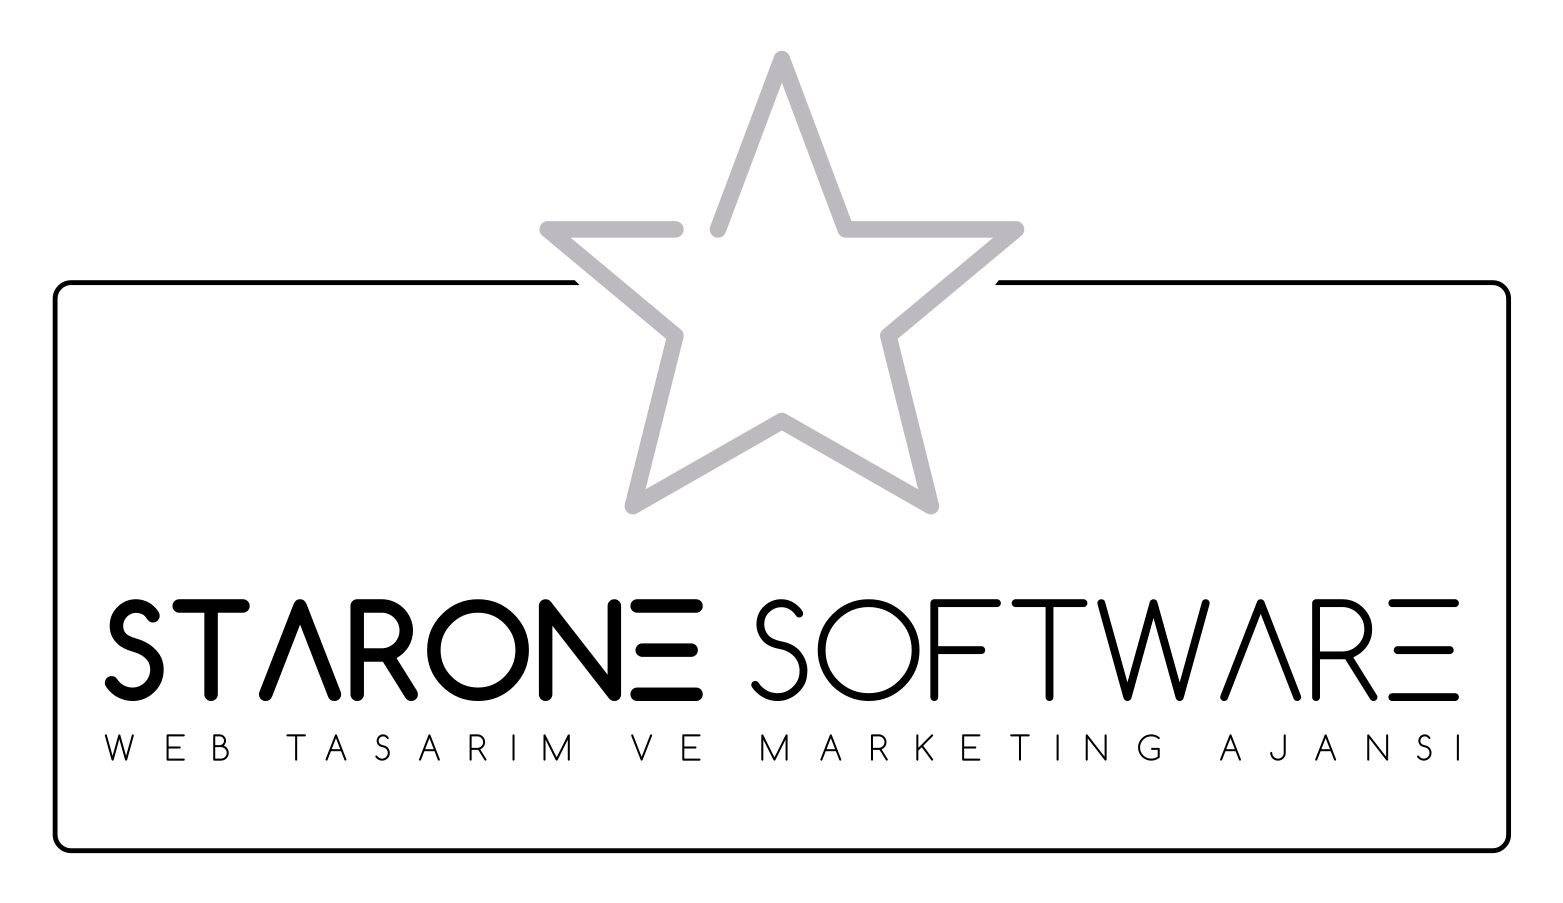 www.staronesoftware.com